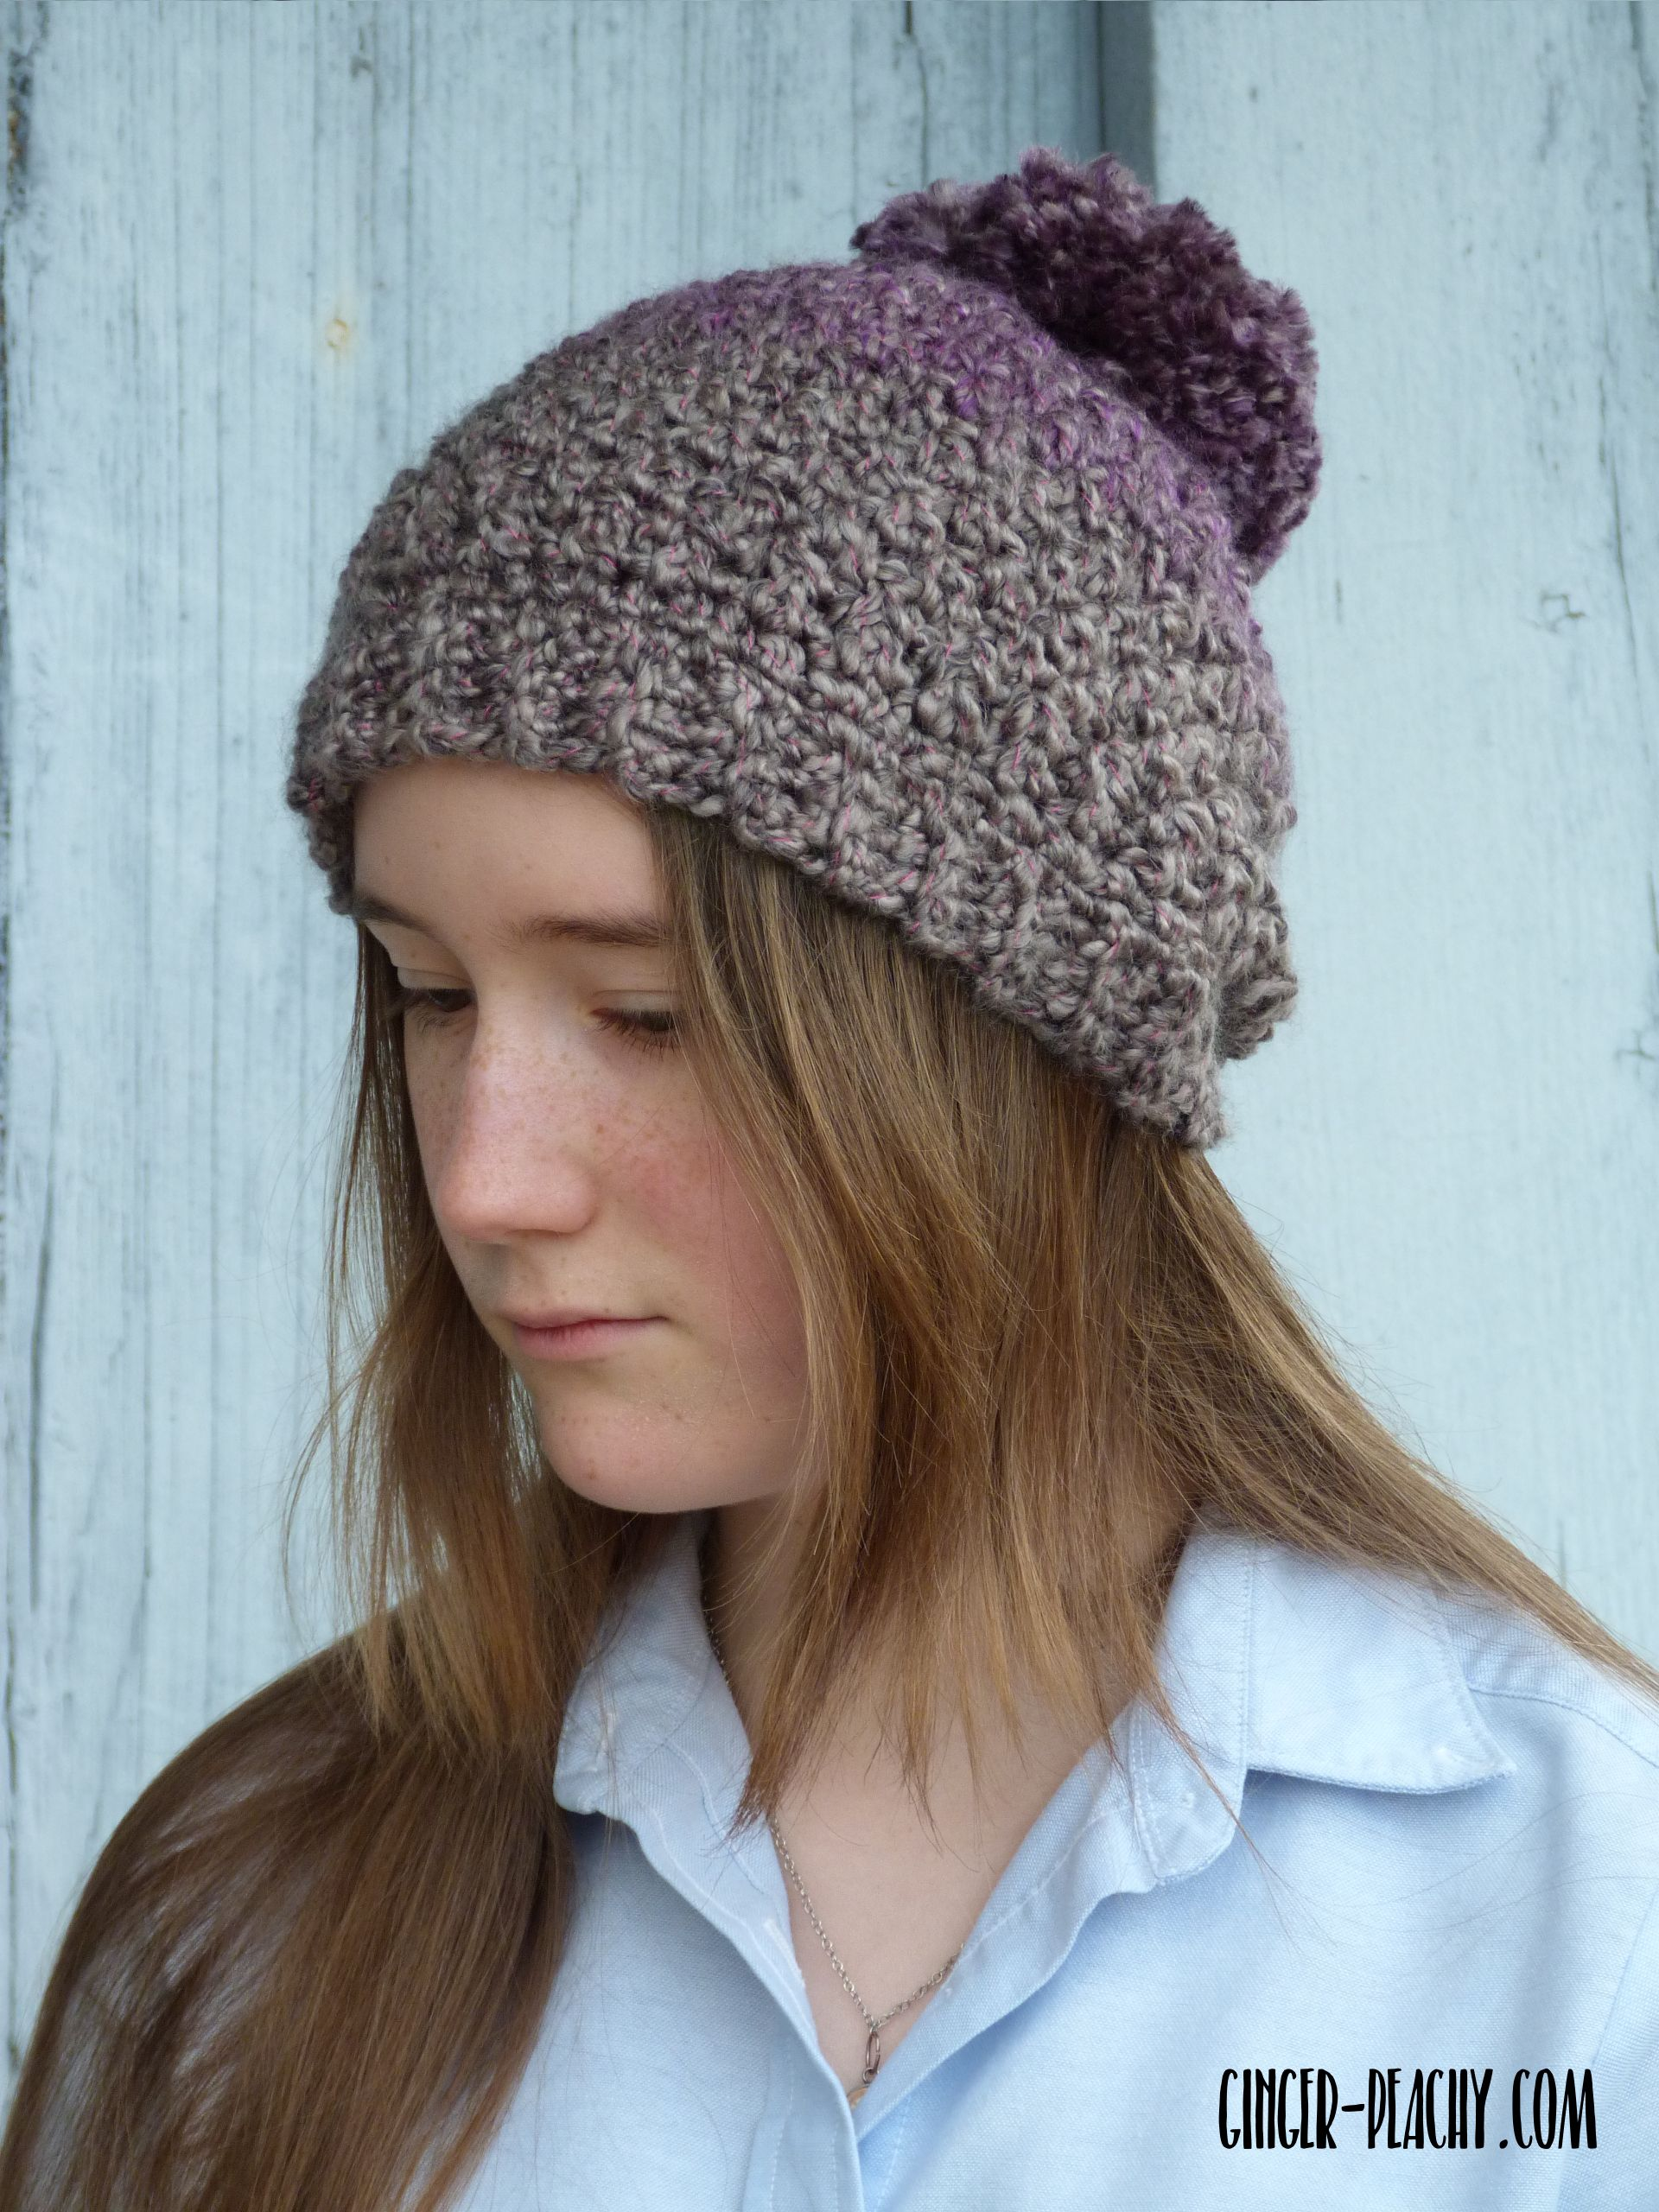 Juneau Beanie | Free Crochet Pattern at Ginger-Peachy.com | Crochet ...